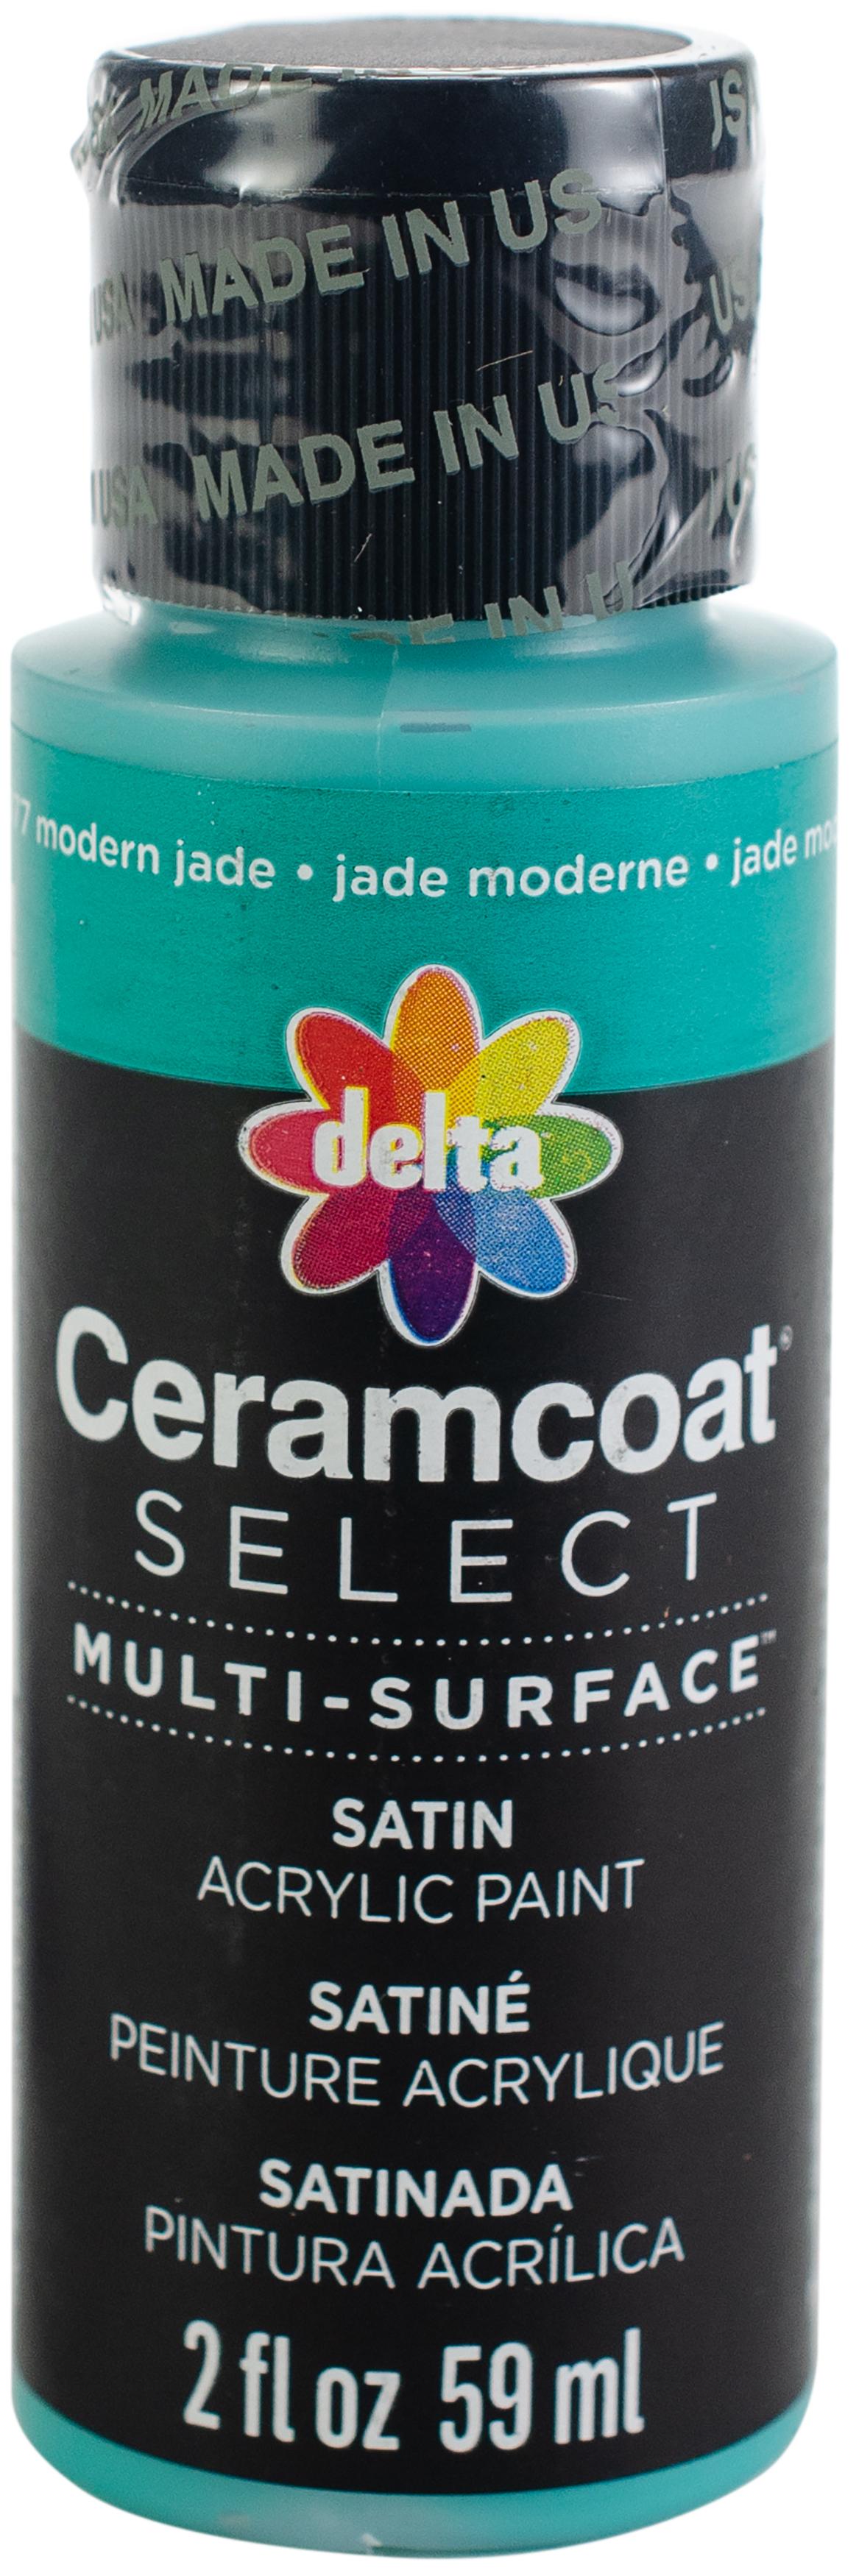 Ceramcoat Select Multi-Surface Paint 2oz